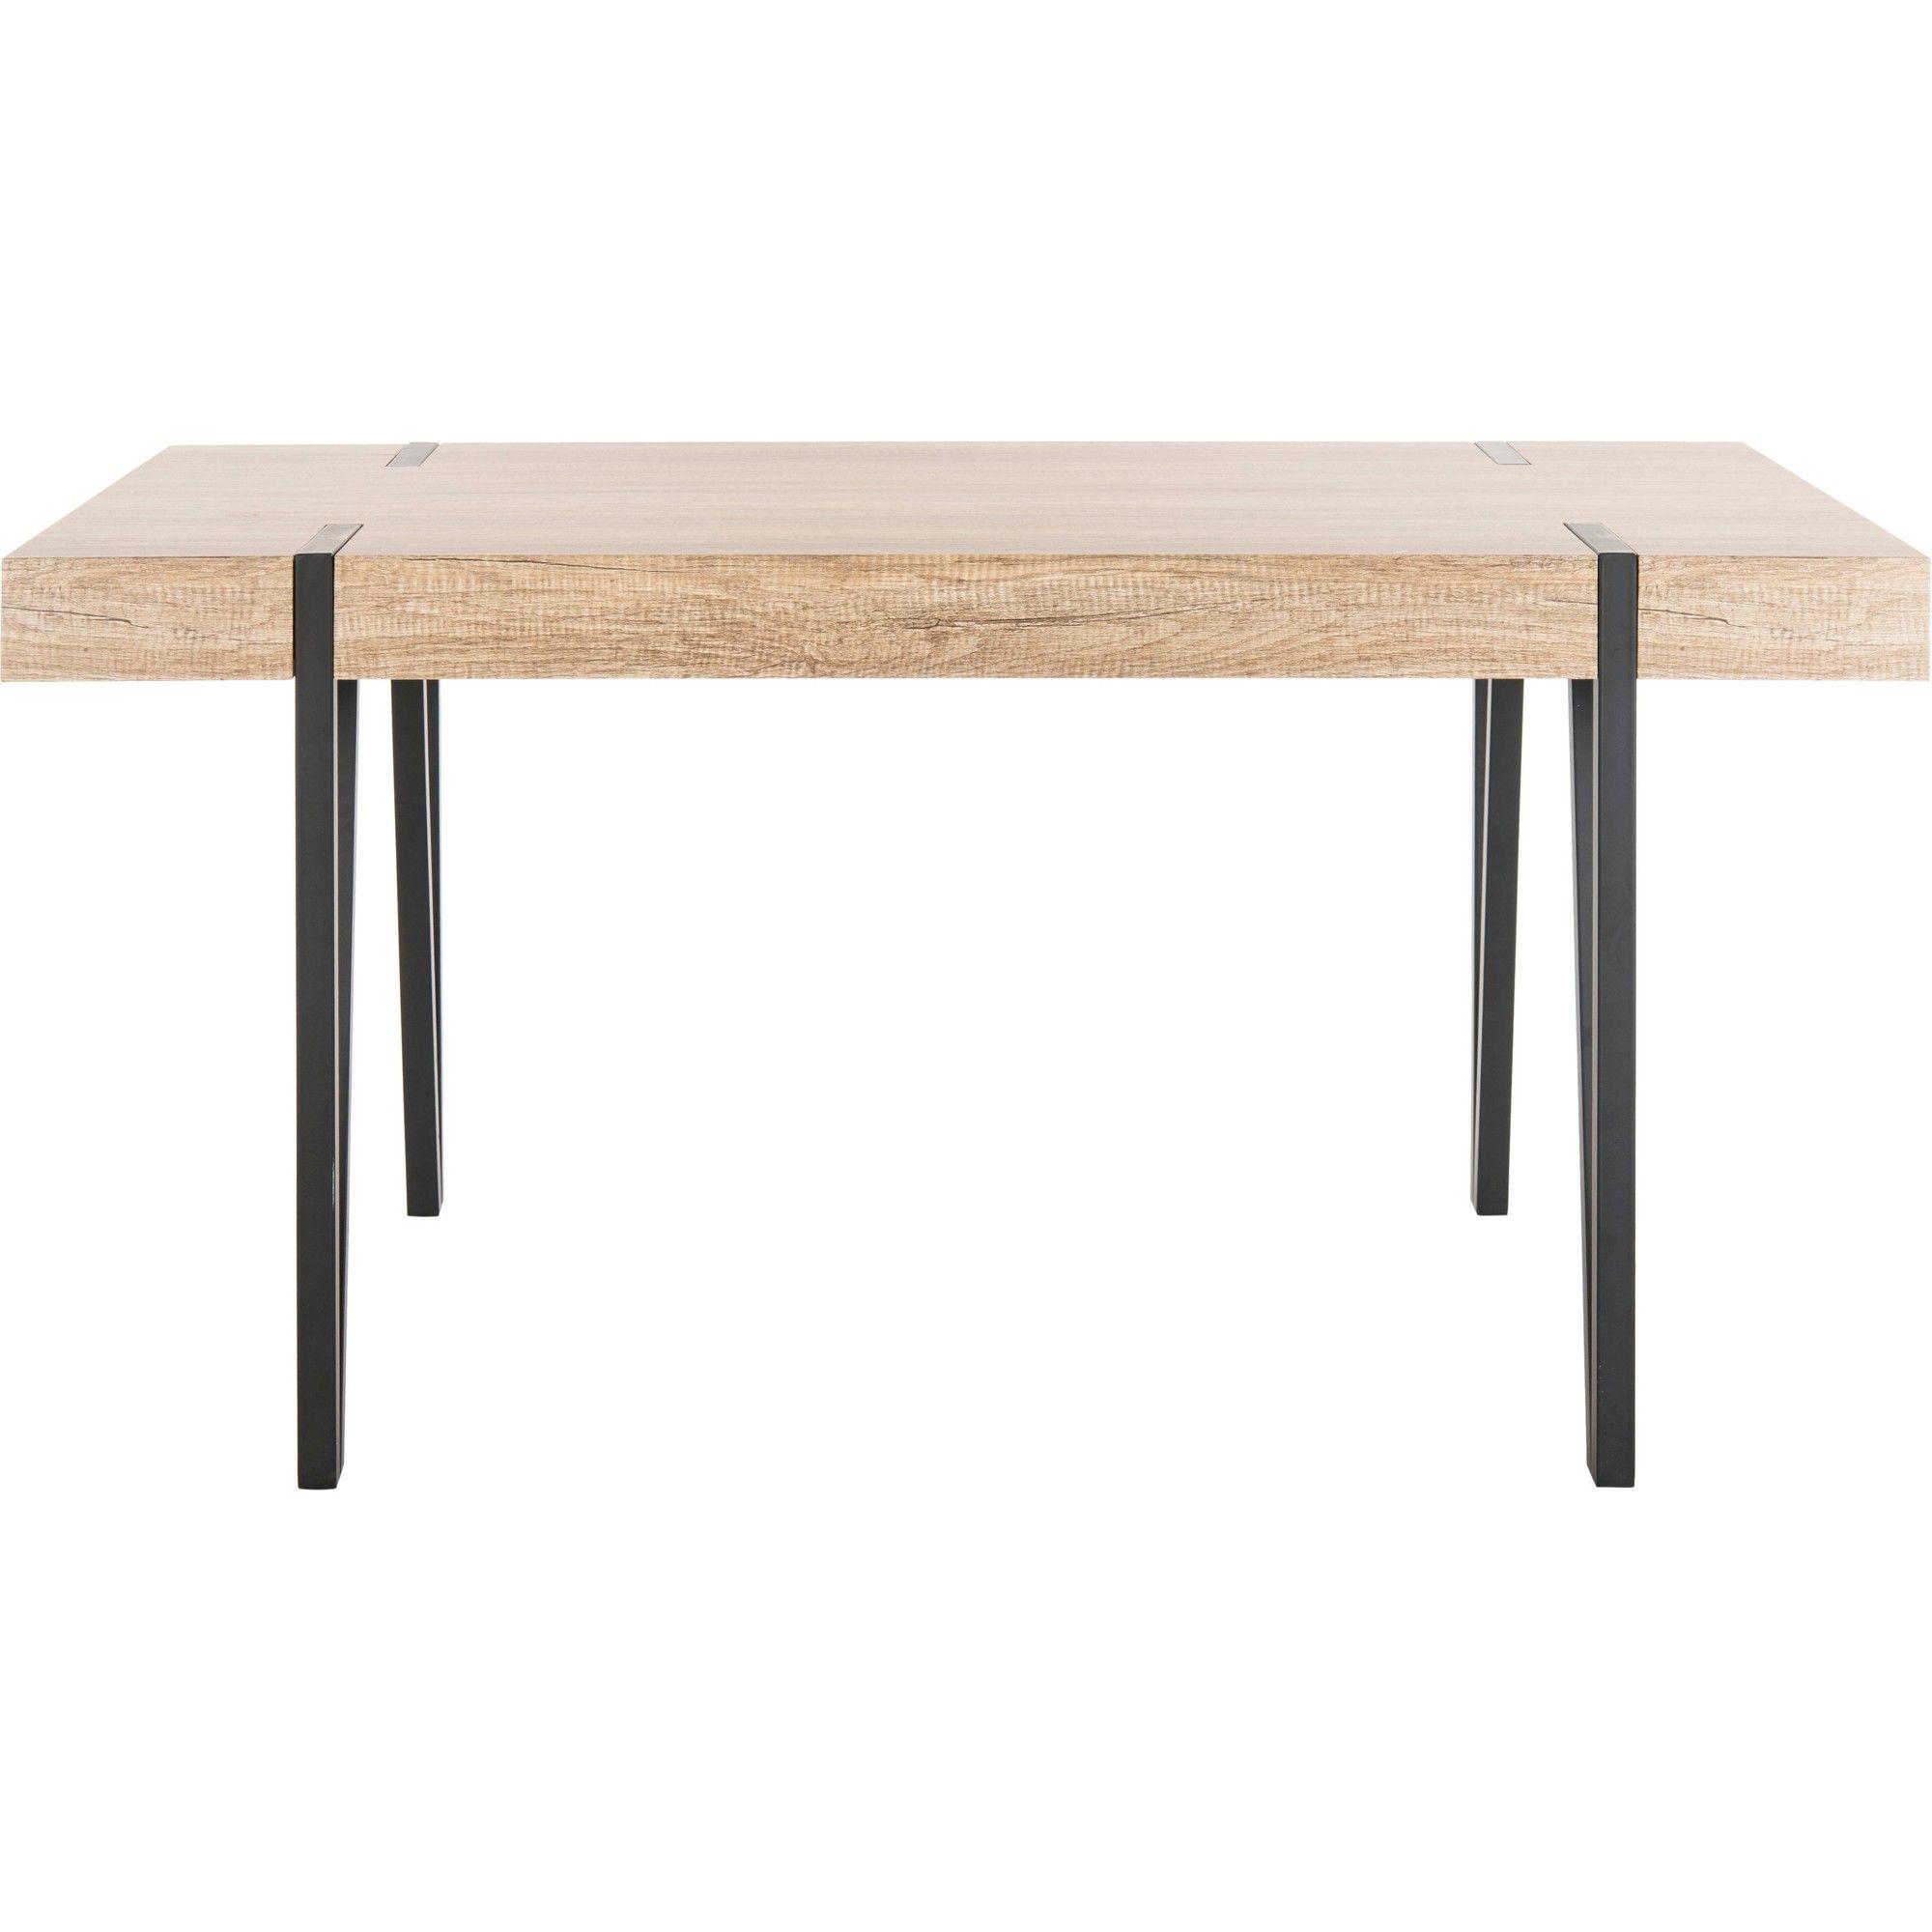 Alyssa Wood Top Dining Table Gray Safavieh Dining Table